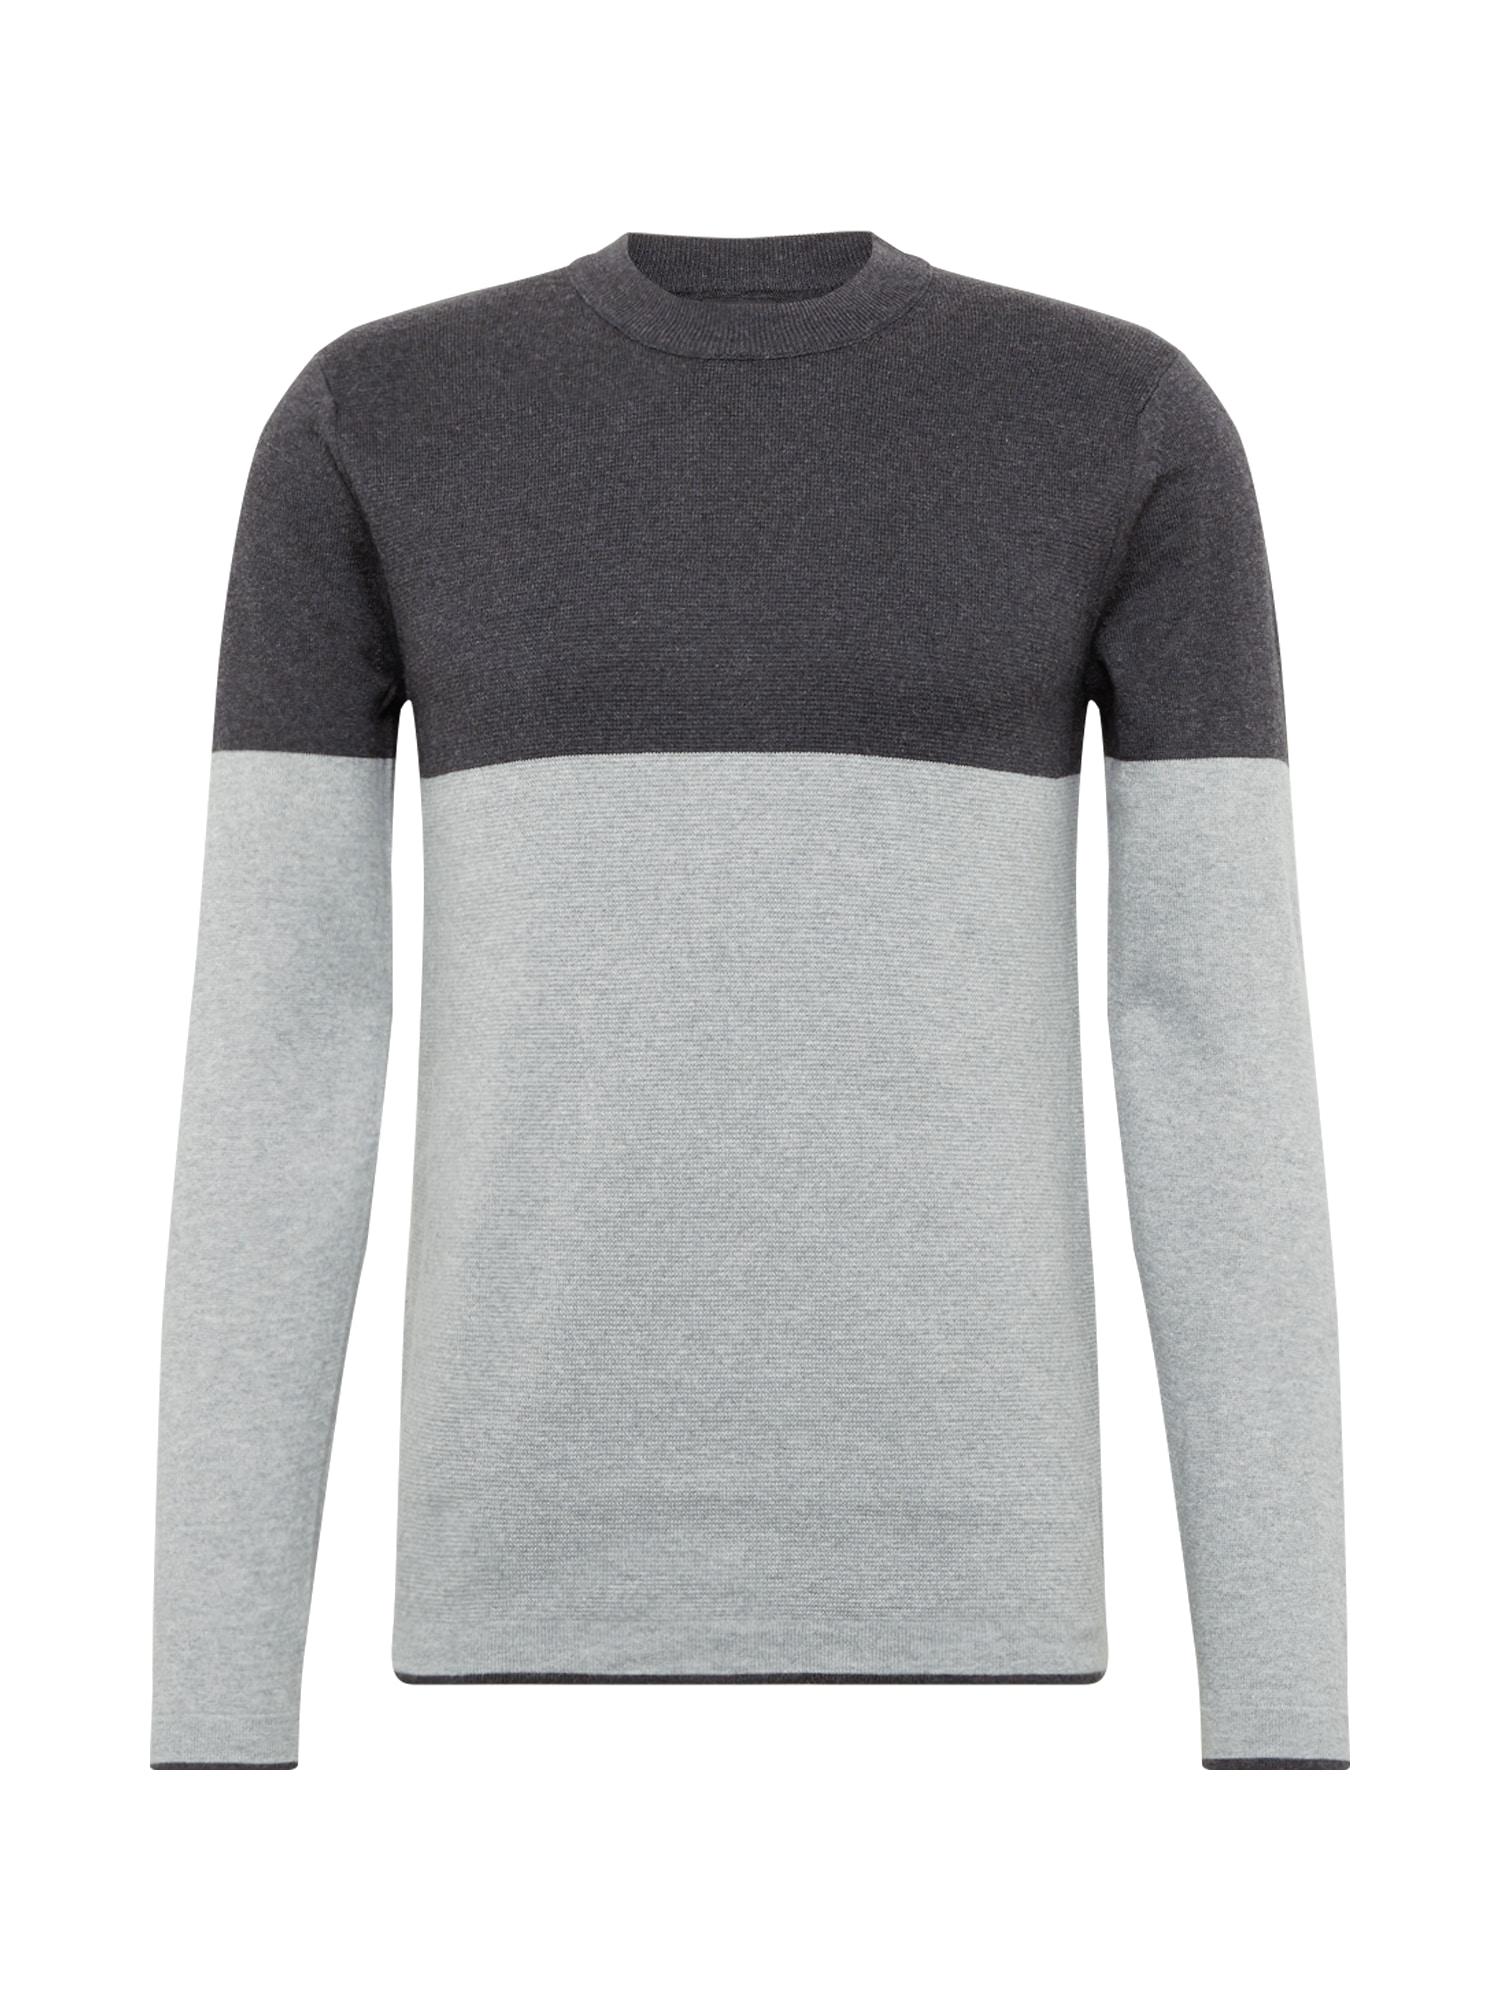 BURTON MENSWEAR LONDON Svetr 'tate colourblock charcoal grey'  šedá